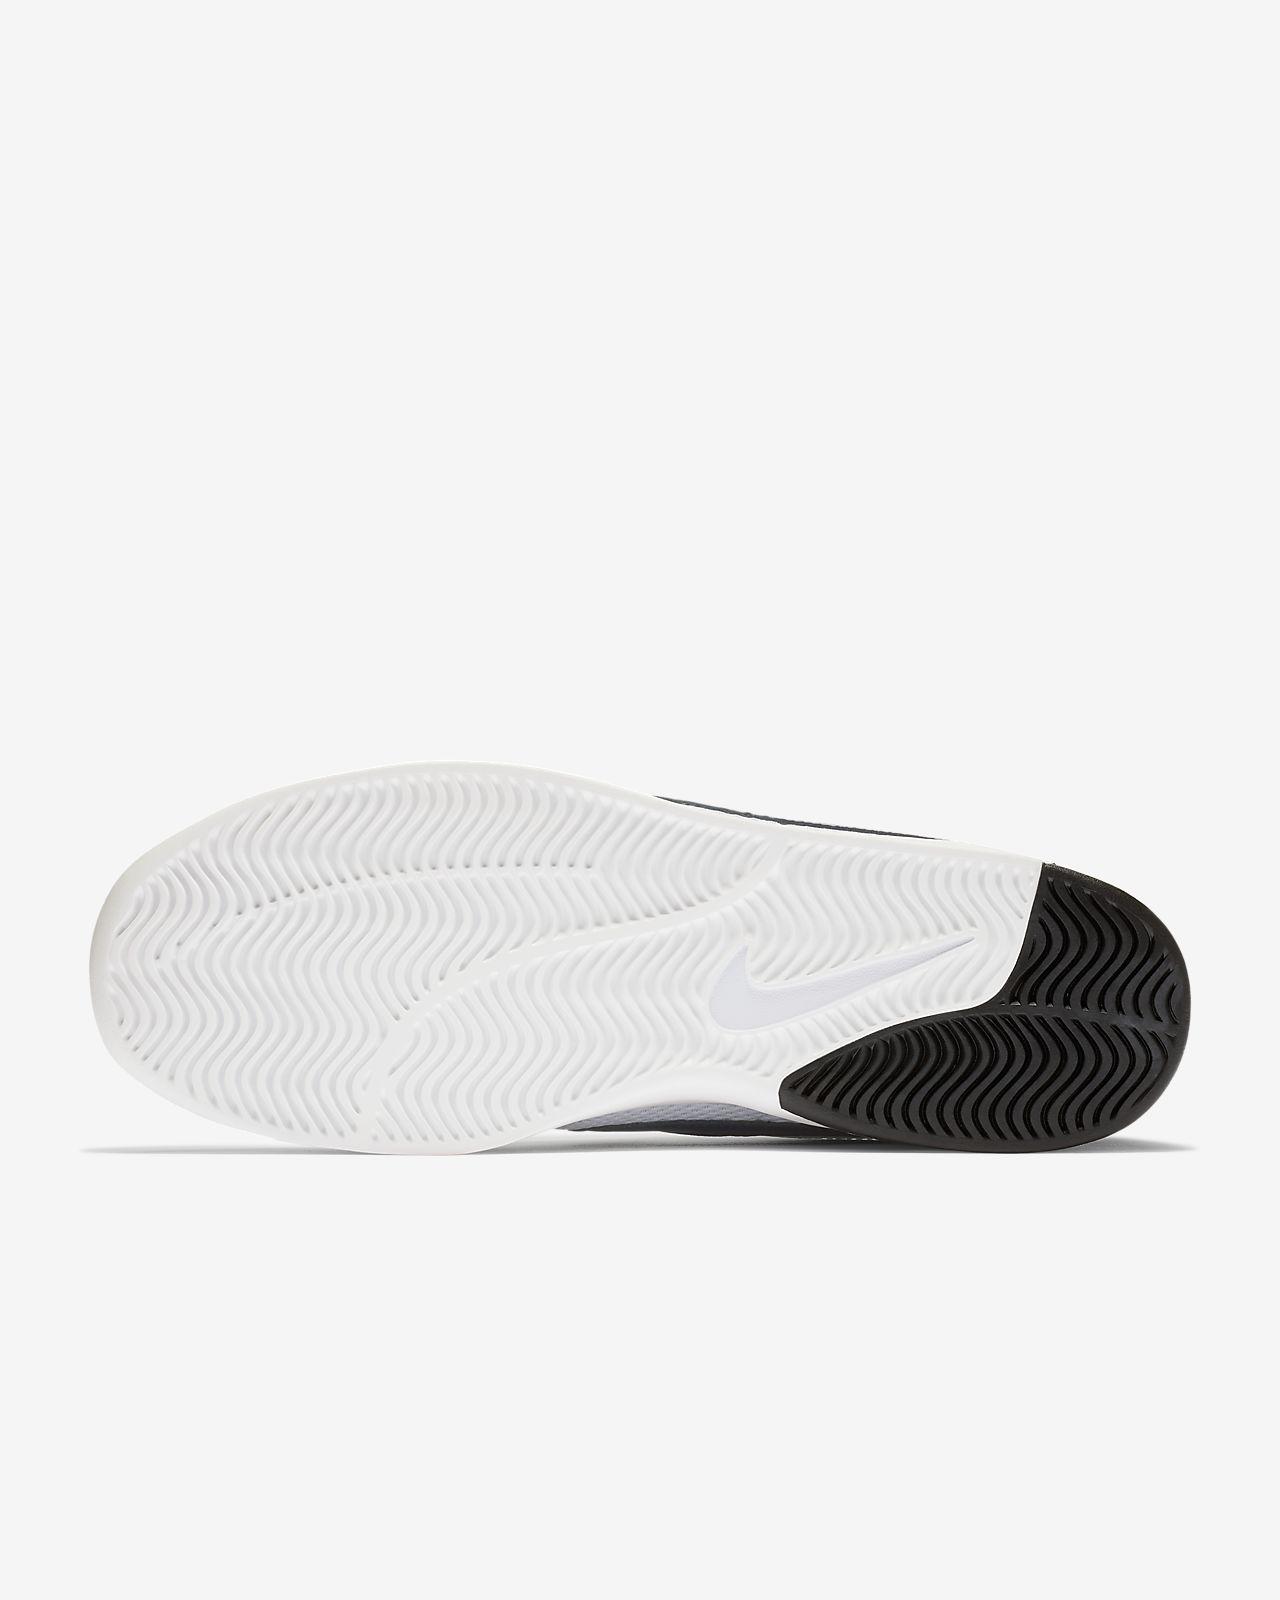 a1c3928759d9 Nike SB Air Max Bruin Vapor Men s Skate Shoe. Nike.com